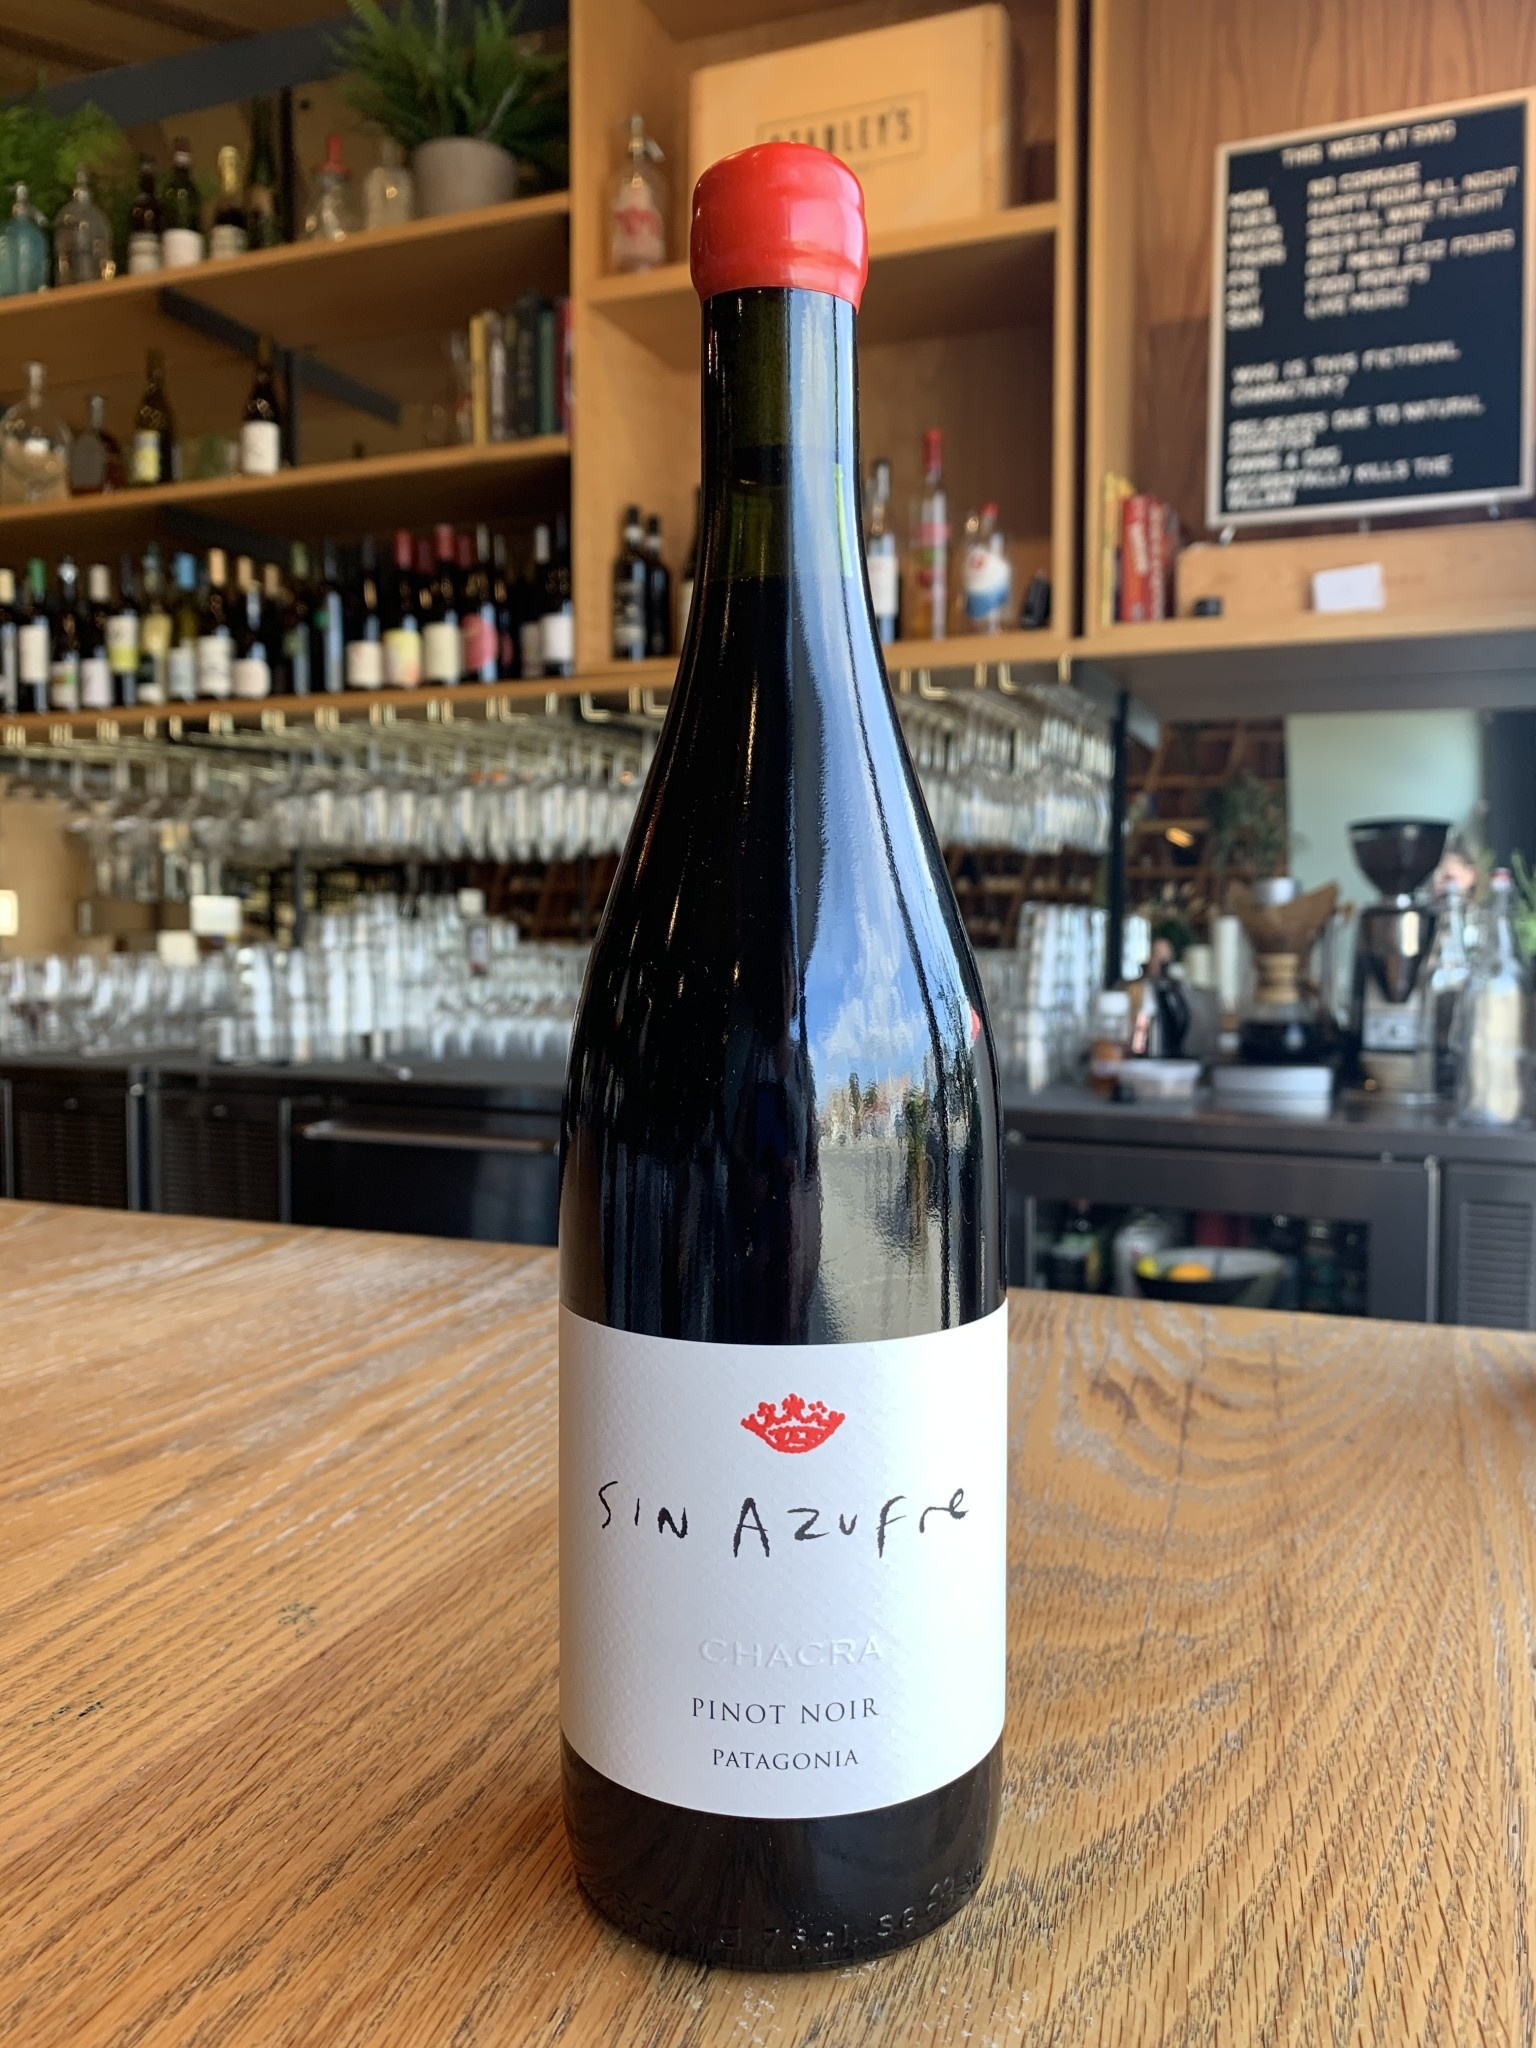 Bodega Chacra 2018 Bodega Chacra Pinot Noir Sin Azufre 750ml